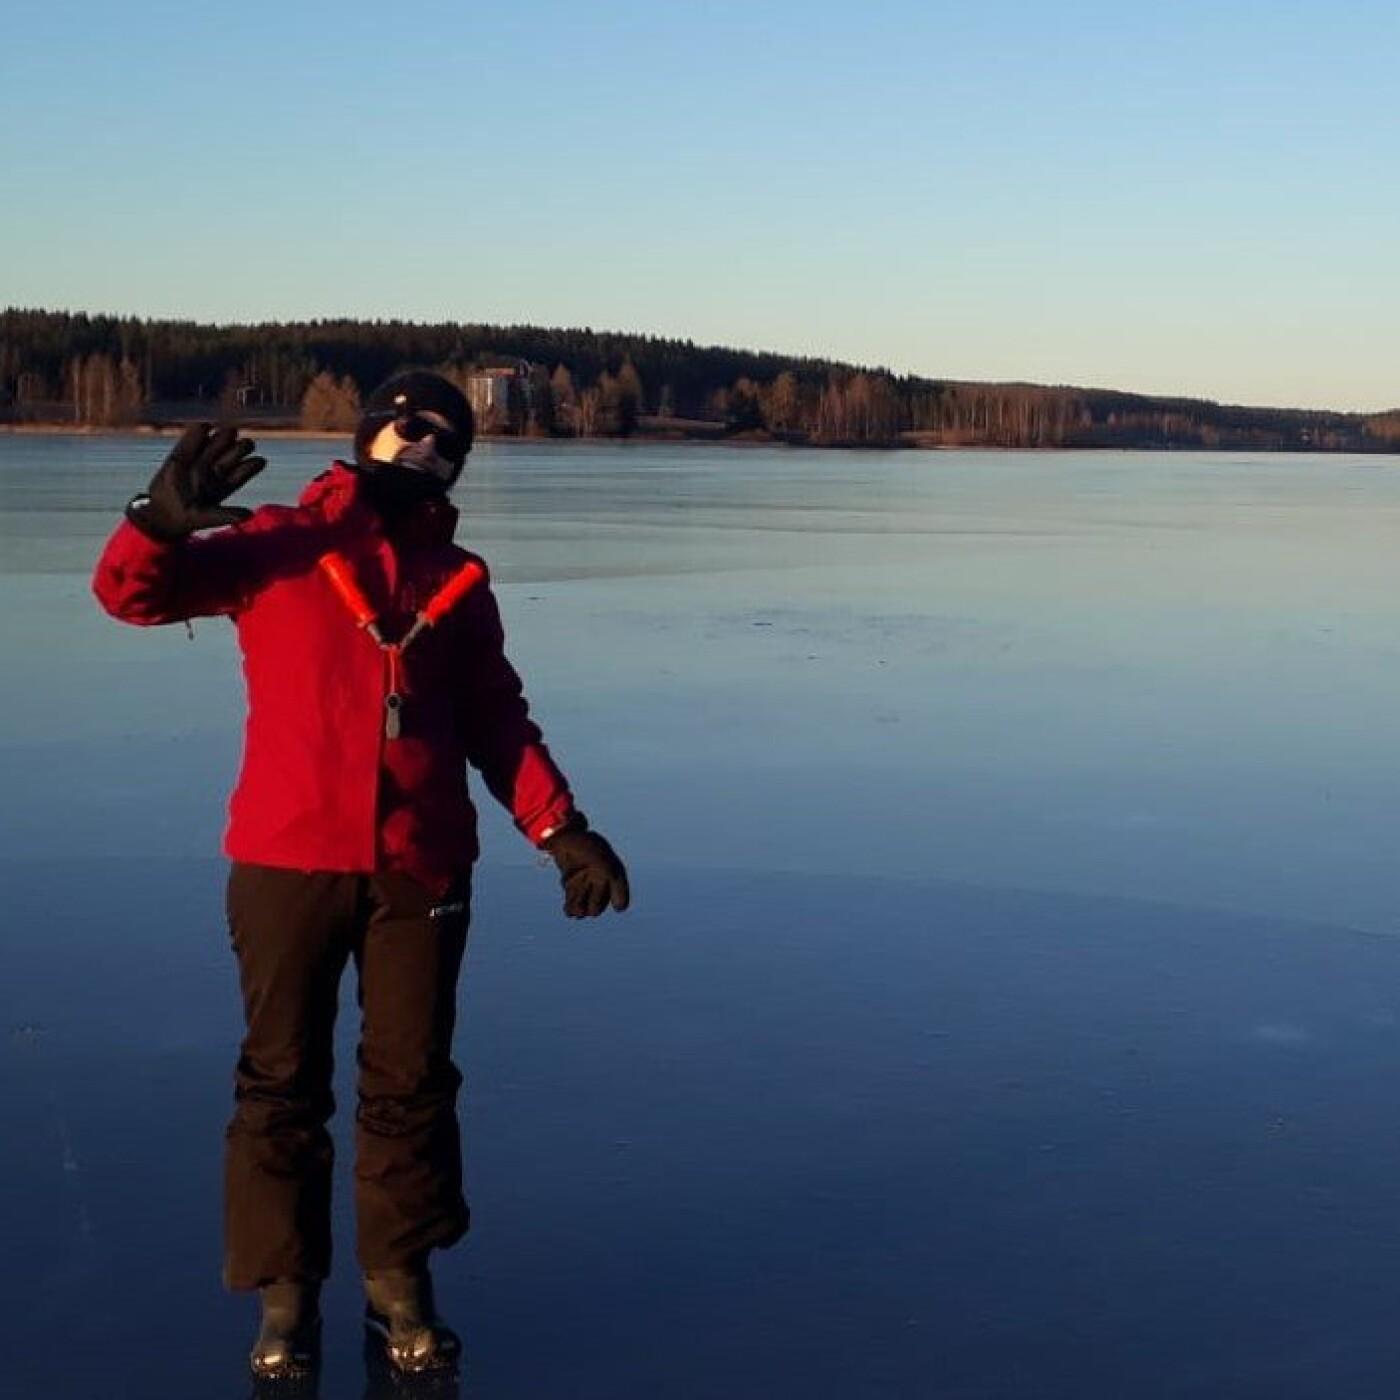 Aurore est en Finlande, une culture bien différente que la France - 14 09 2021 - StereoChic Radio